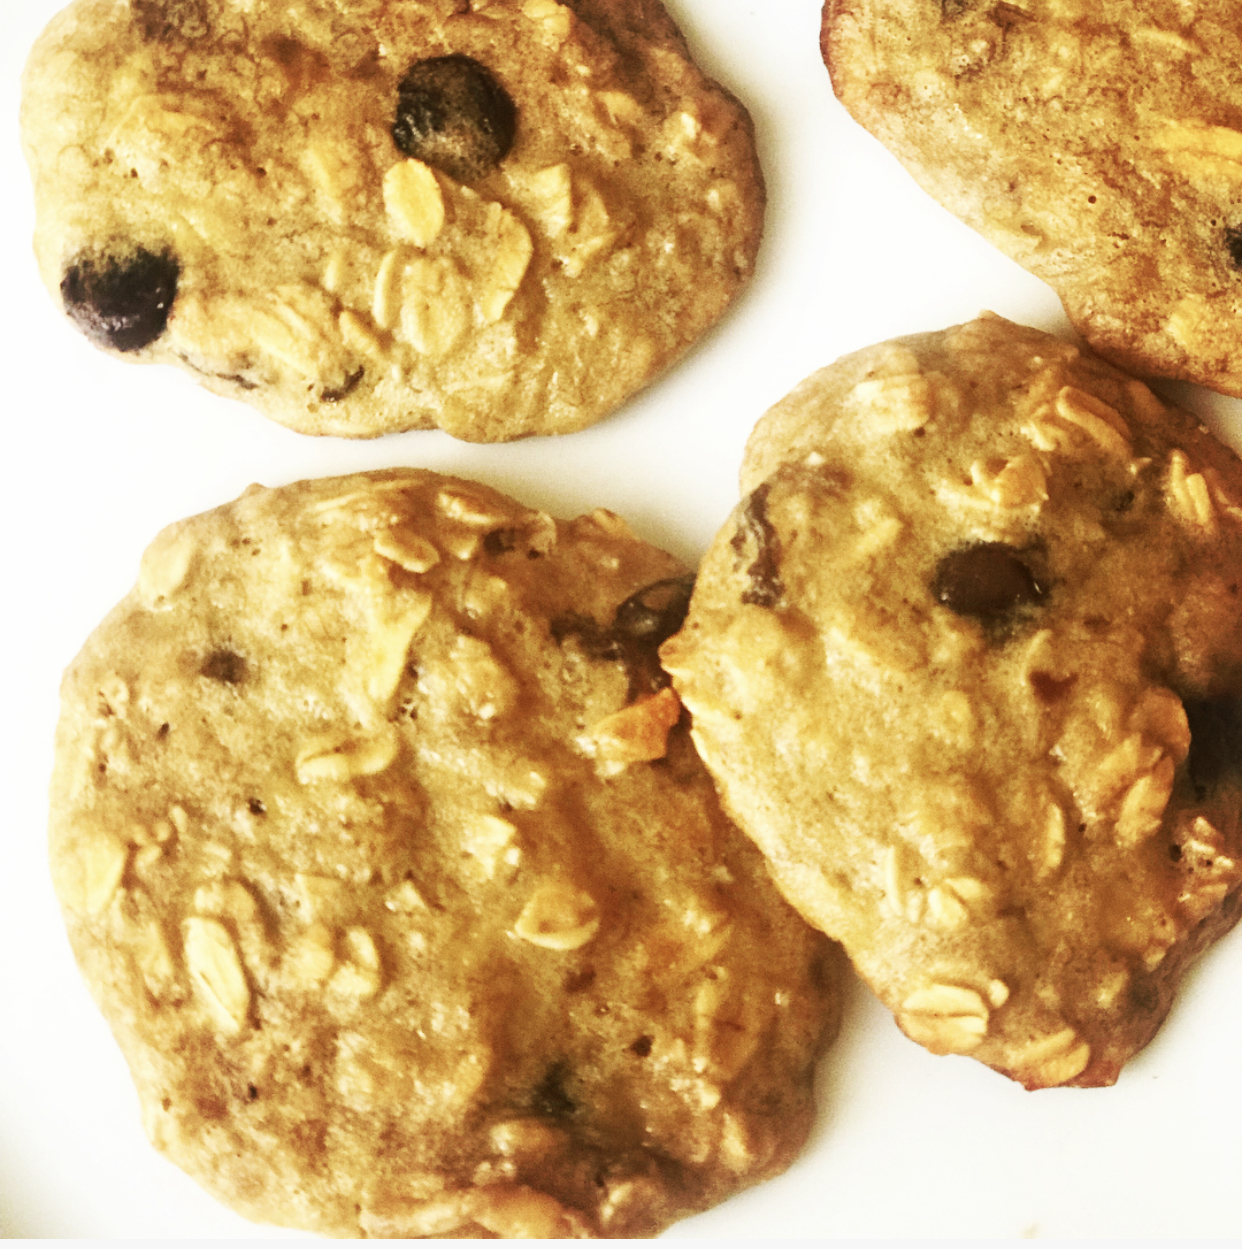 Swiss's Oatmeal Raisin Banana Cookies